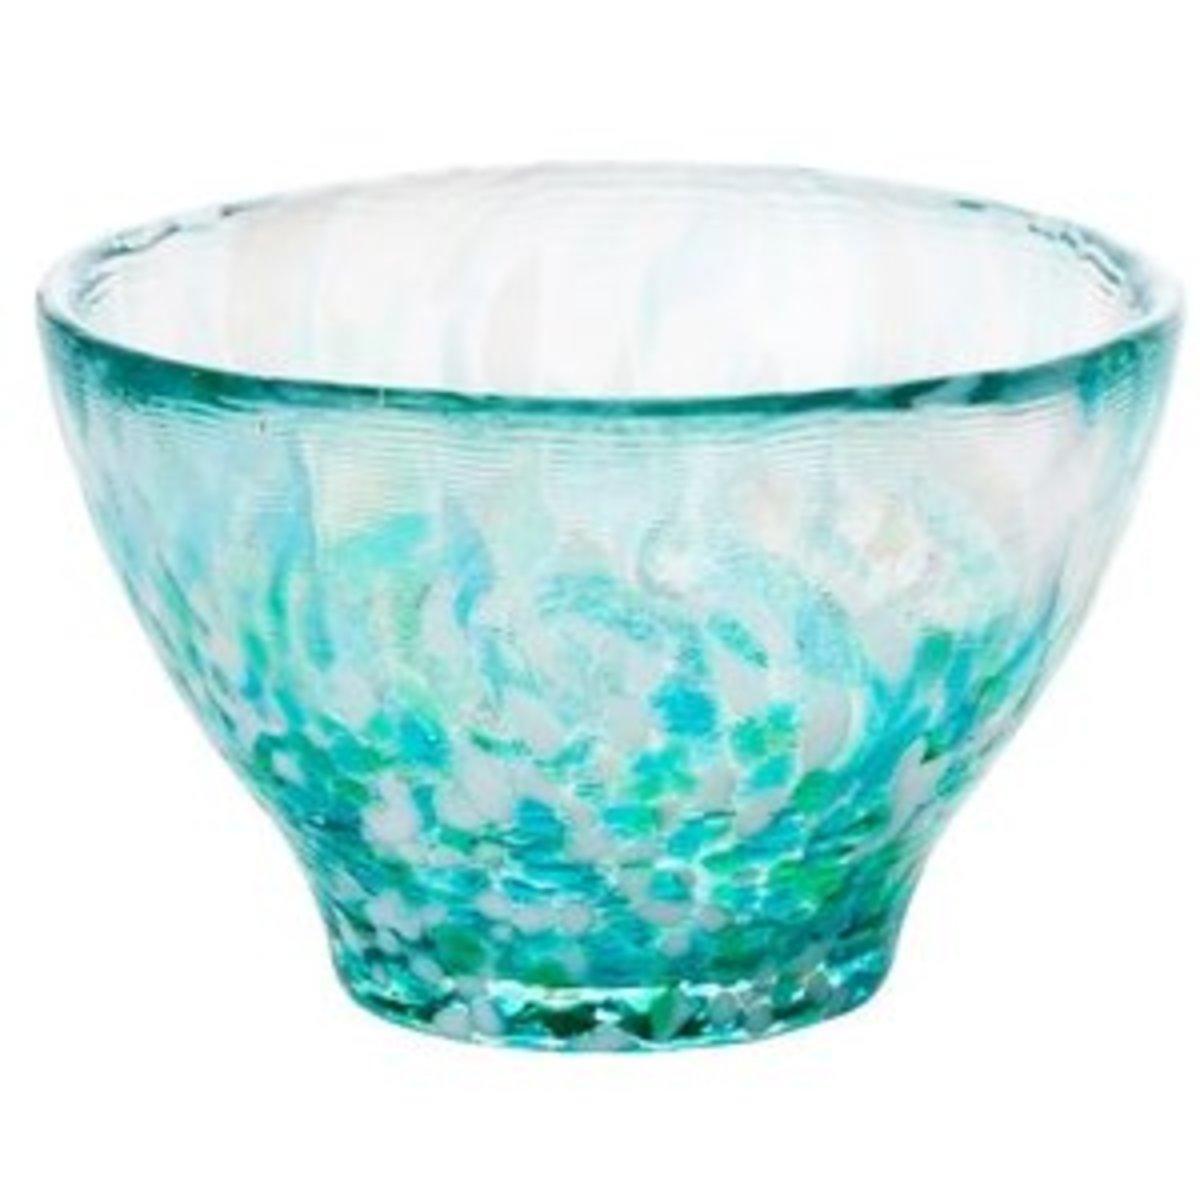 Ishizuka Sake Glass Cup Green Lake - 1pc F-49784